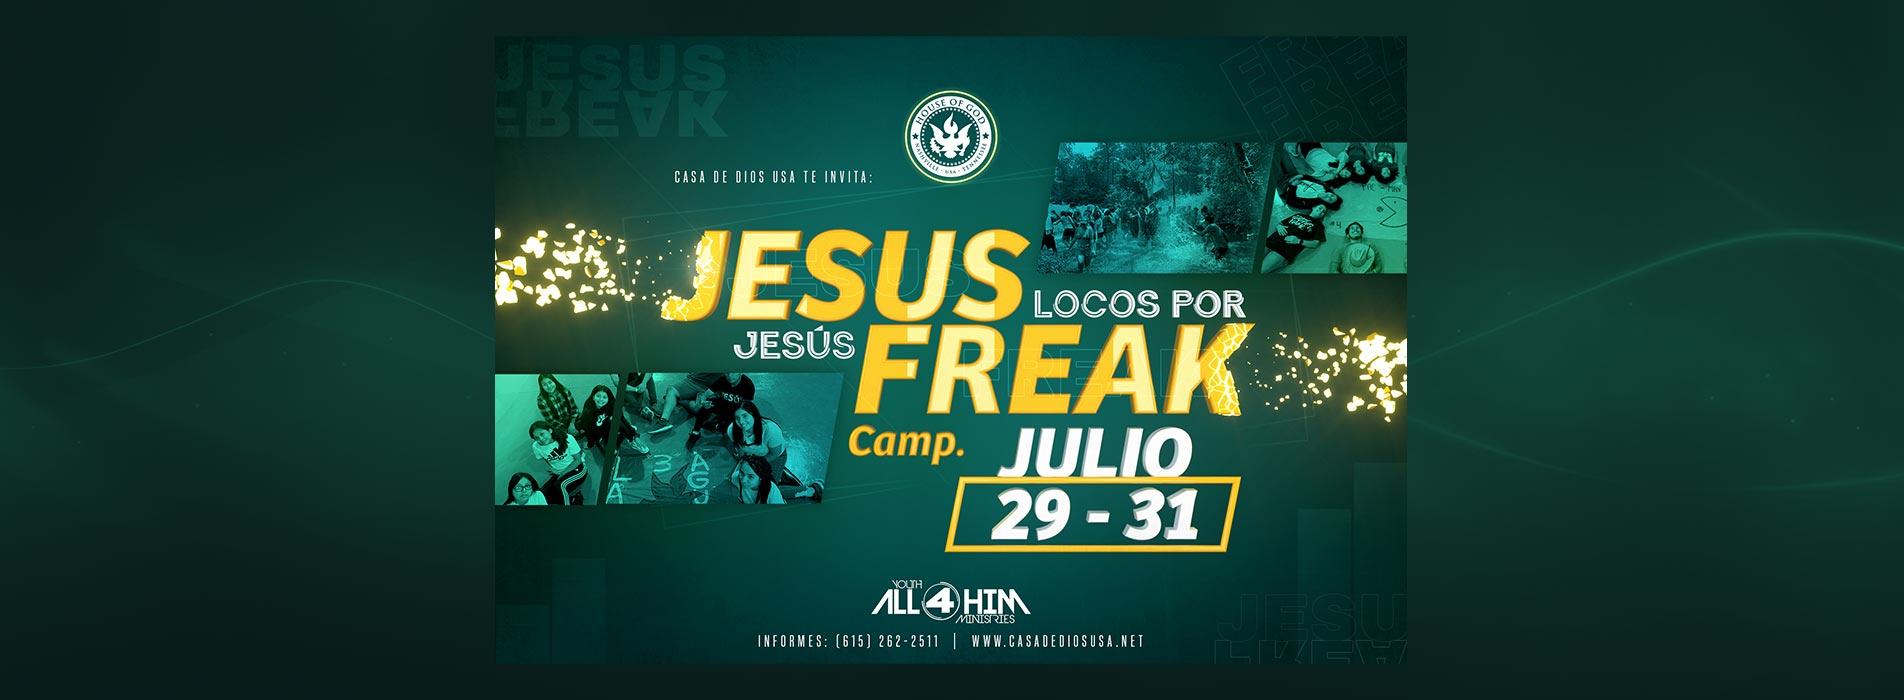 Slider-Campamento-Jesus-Freak-2021